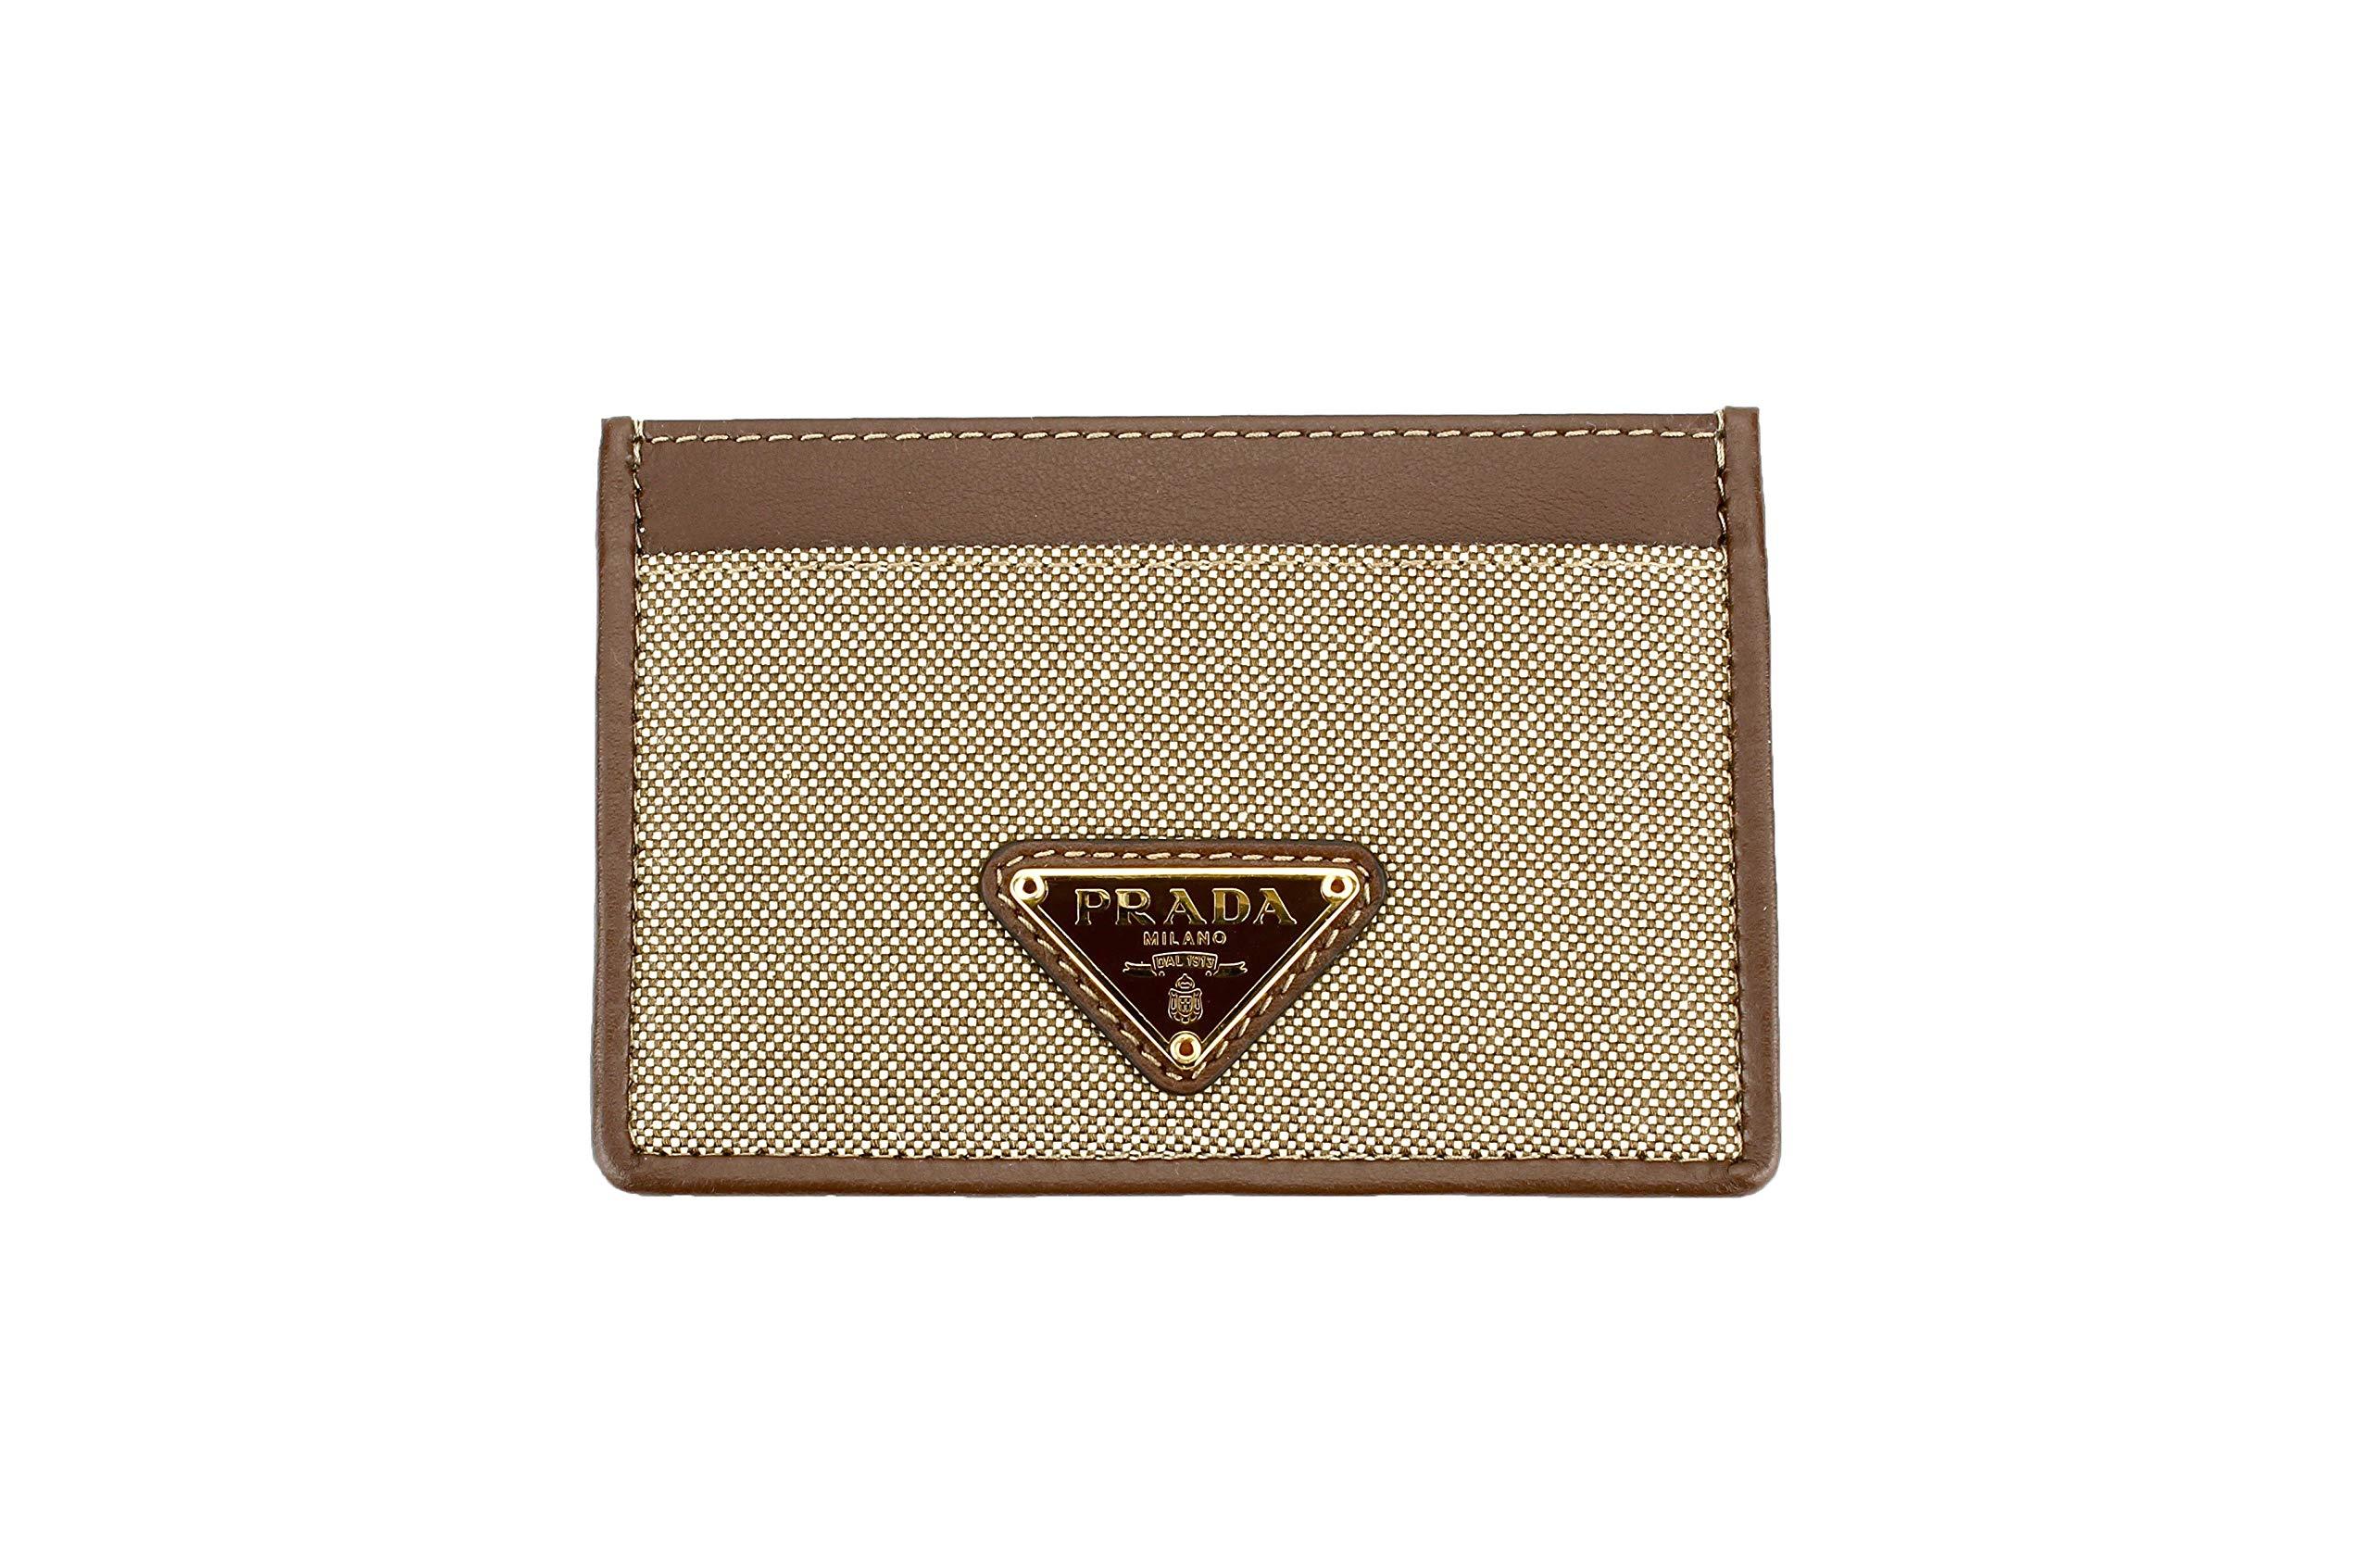 Prada Corda Canvas Logo Plaque Card Case Holder, Brown/beige by Prada (Image #1)